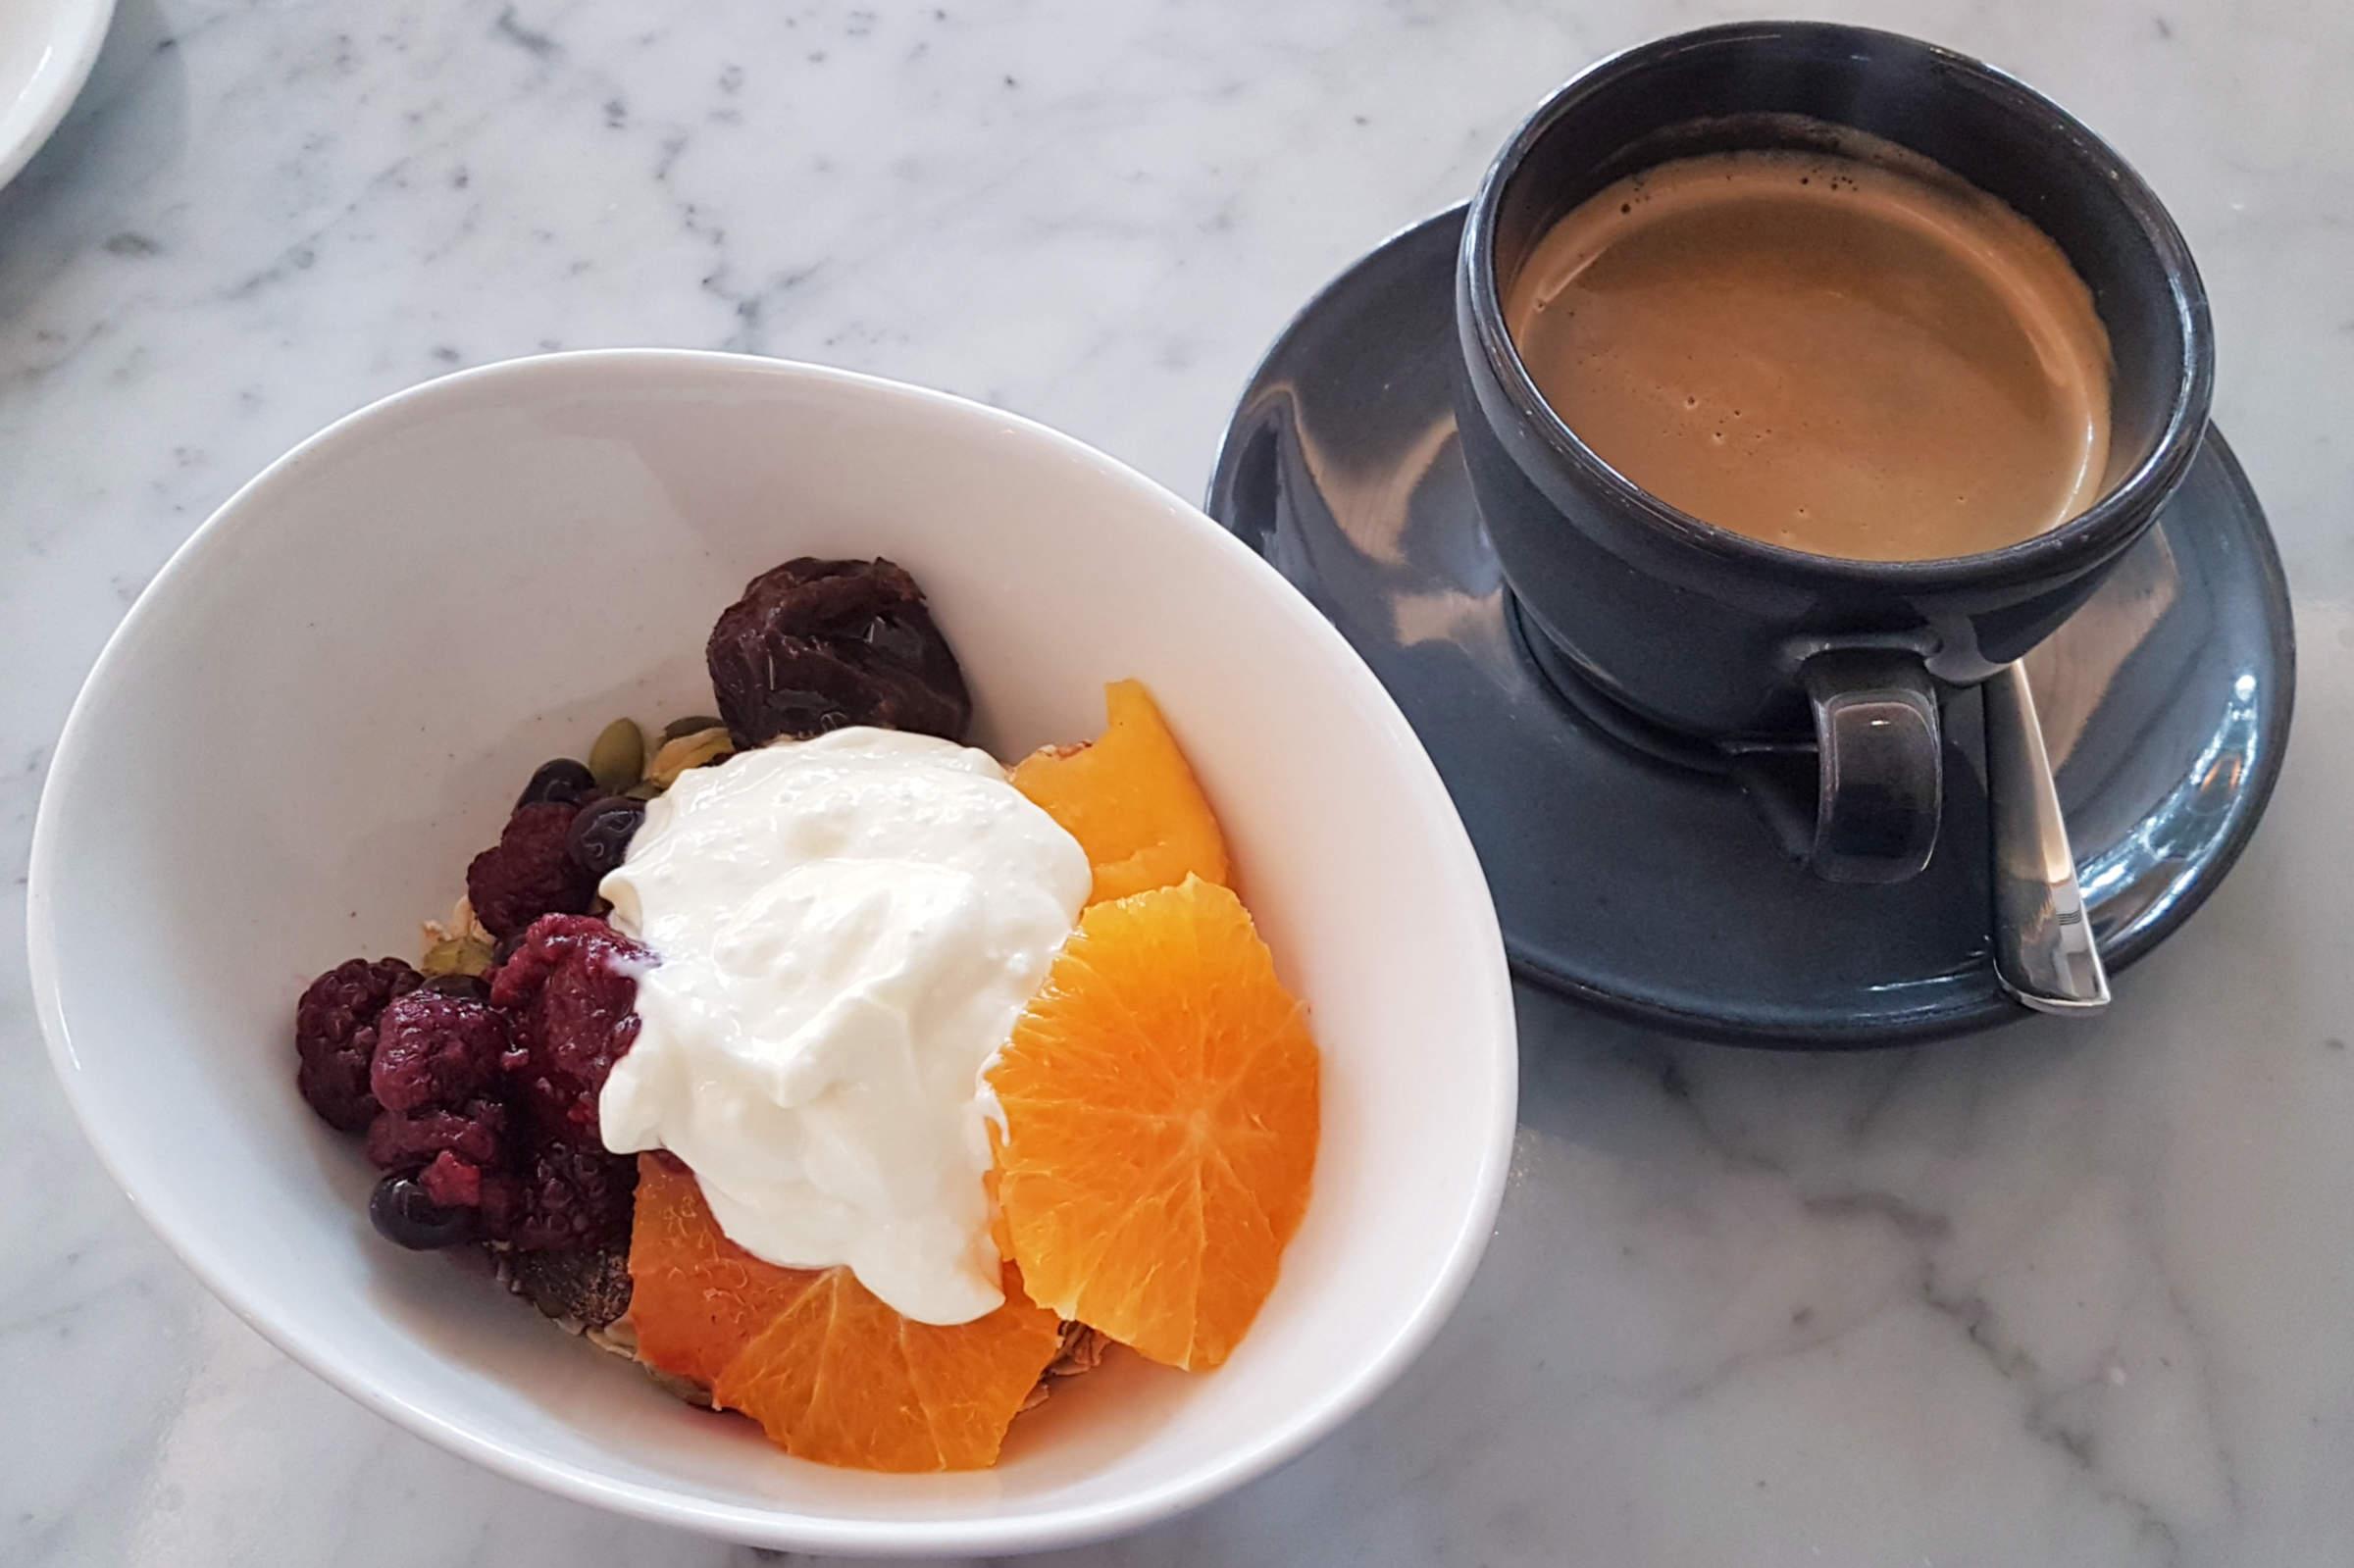 Chameleon - muesli and coffee